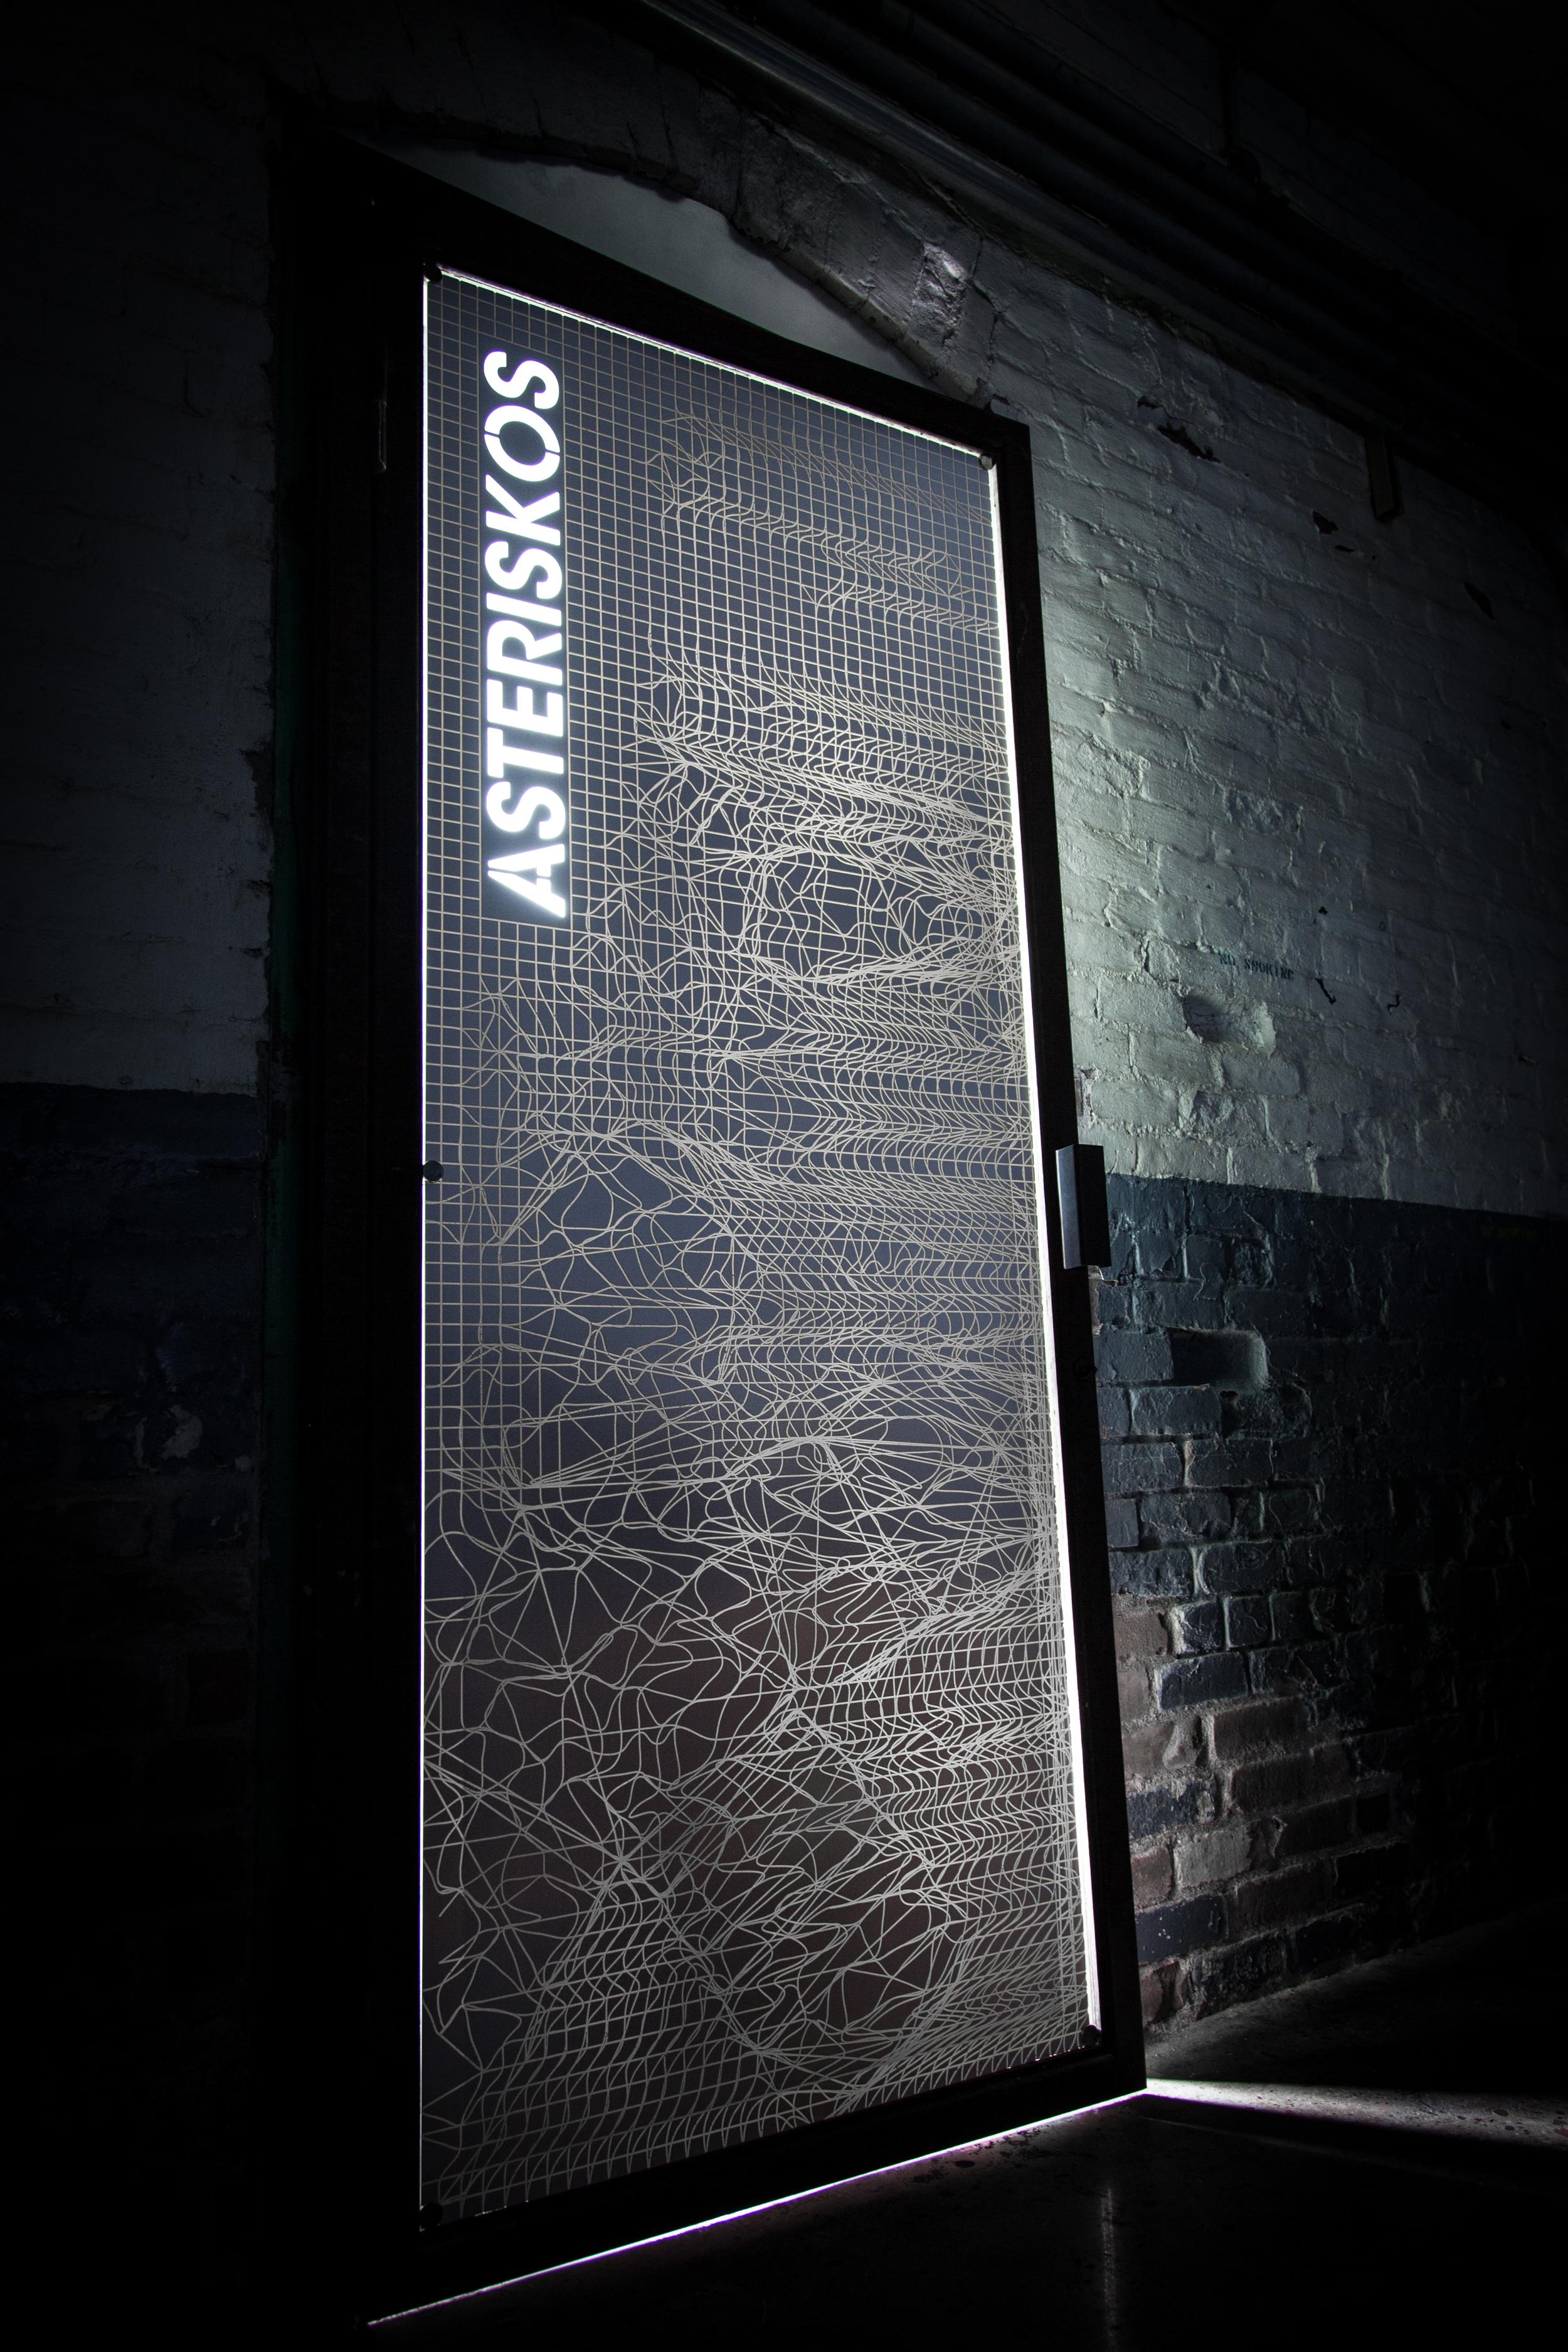 asteriskos-digital-fabrication-diffusion-panel-scripting1.jpg